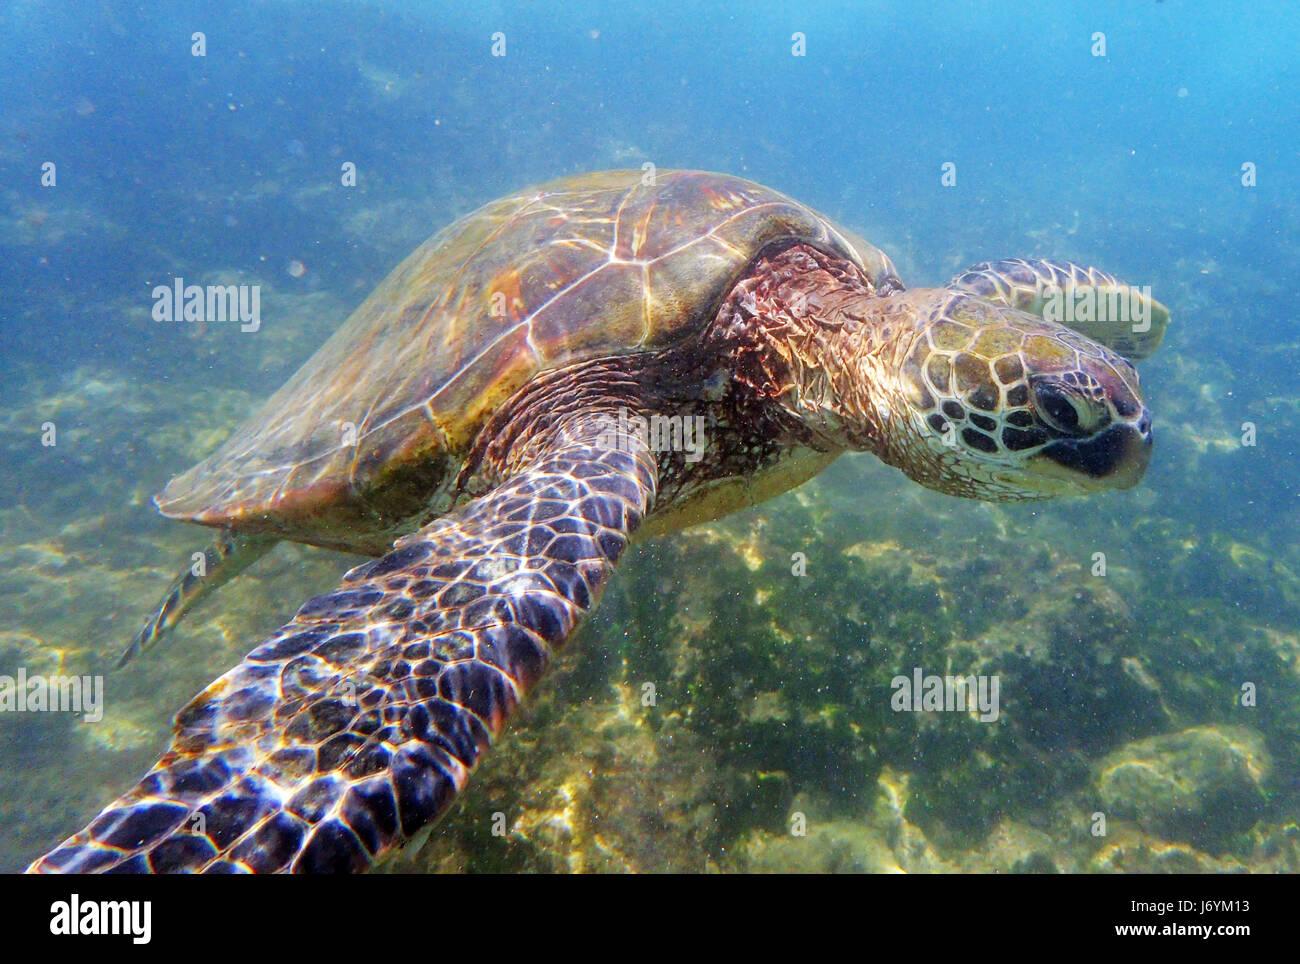 Une tortue de mer verte piscine de la côte de Maui. Hawaï Photo Stock